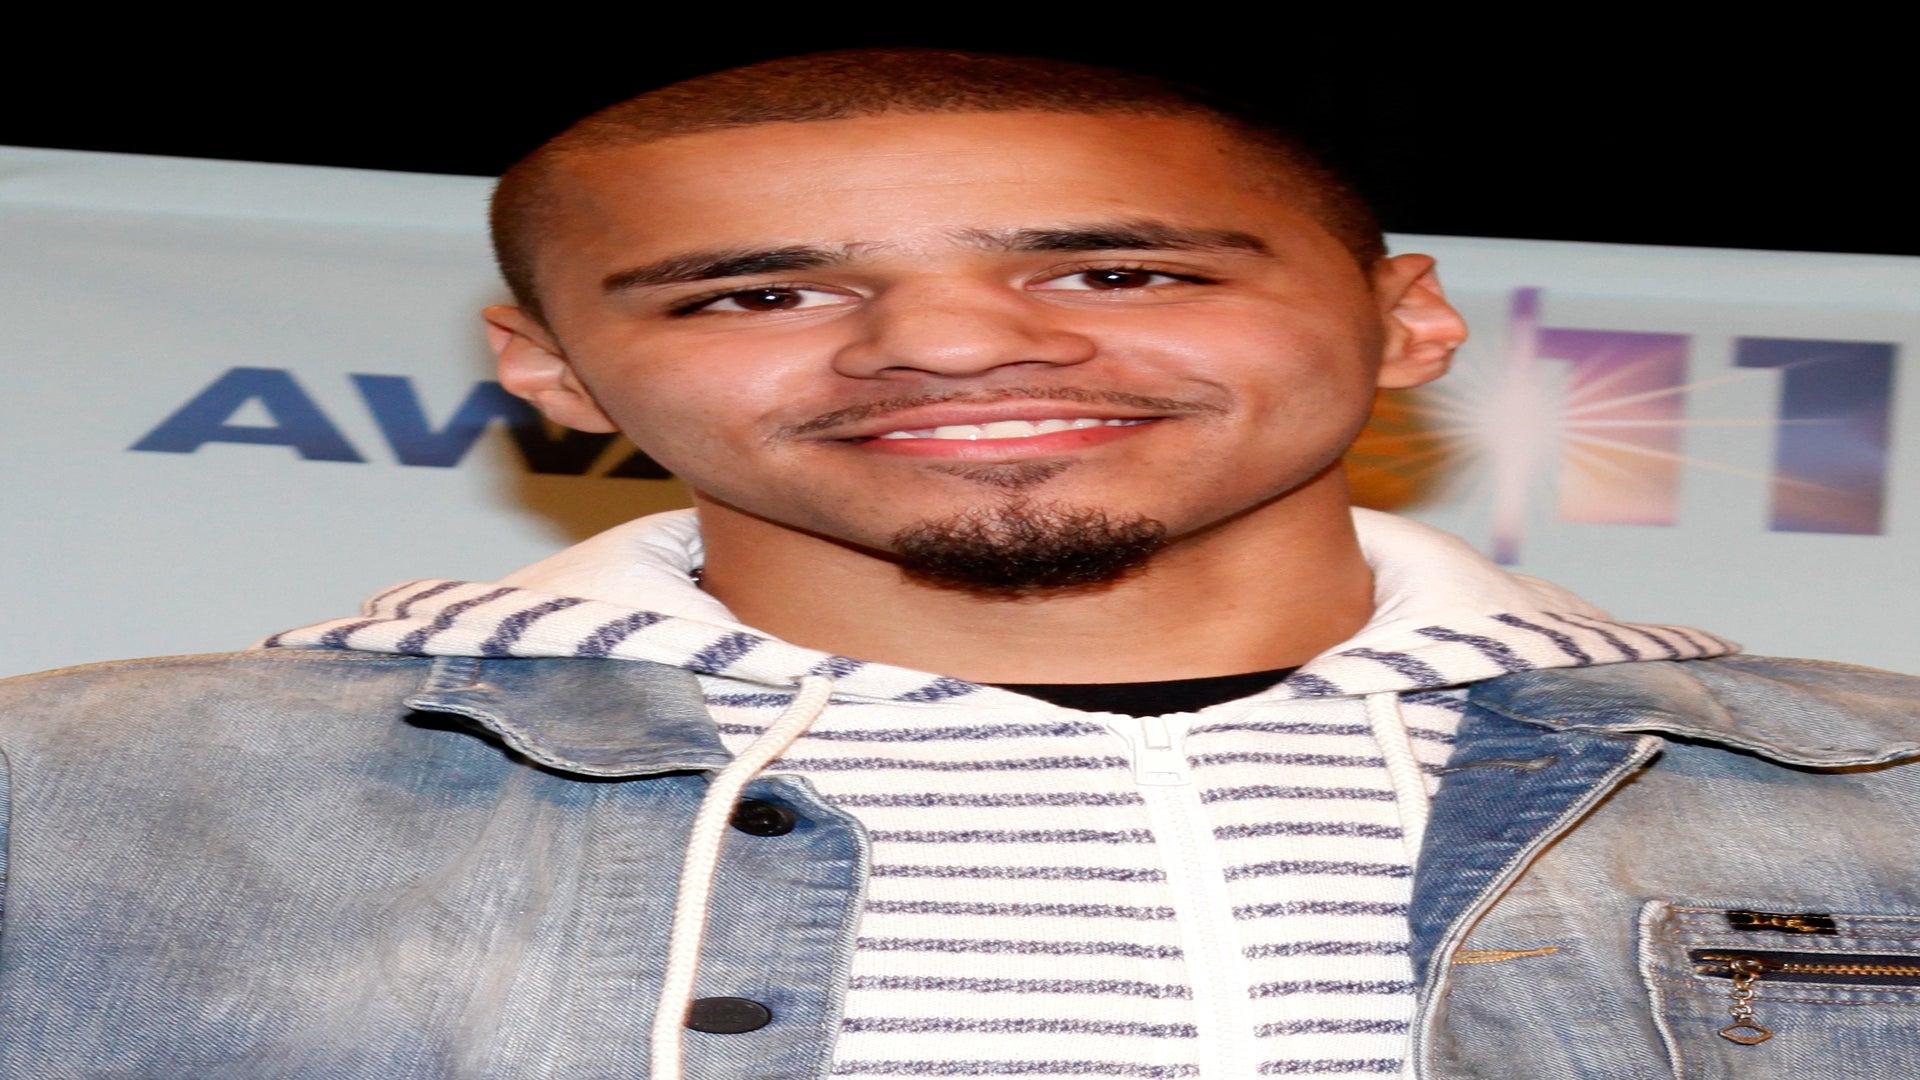 J. Cole's Album Debuts at No. 1